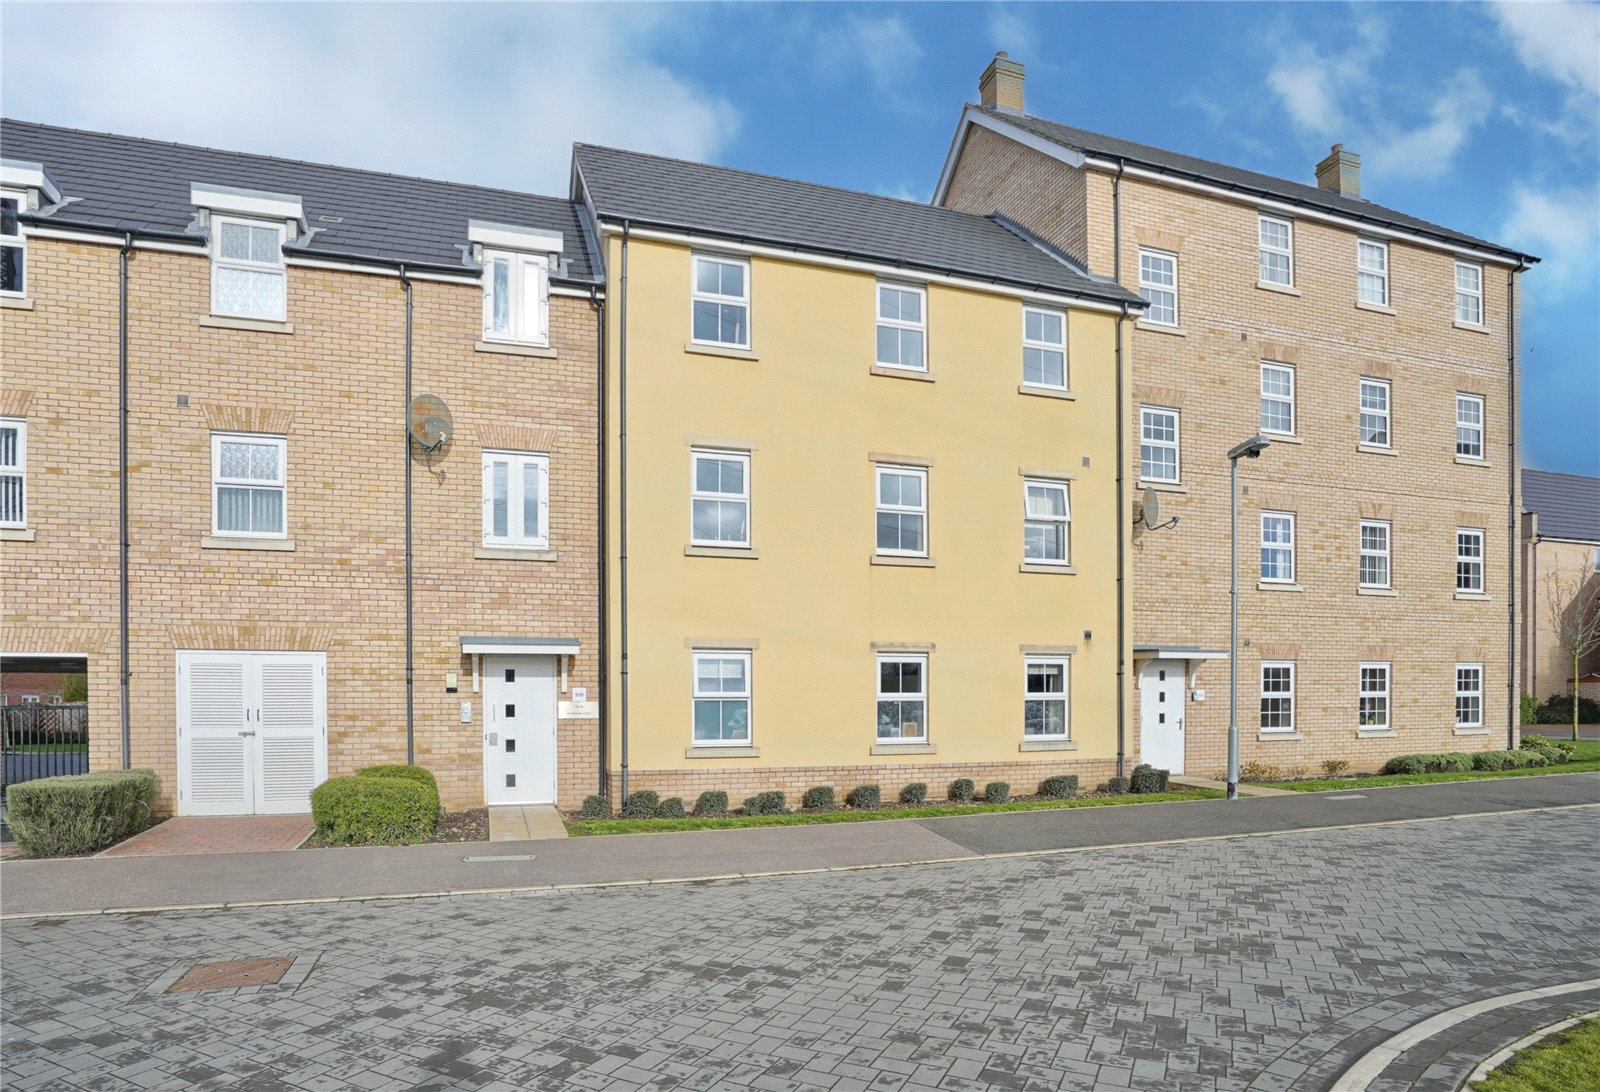 2 bed apartment for sale in Delphinium Court, Eynesbury, PE19